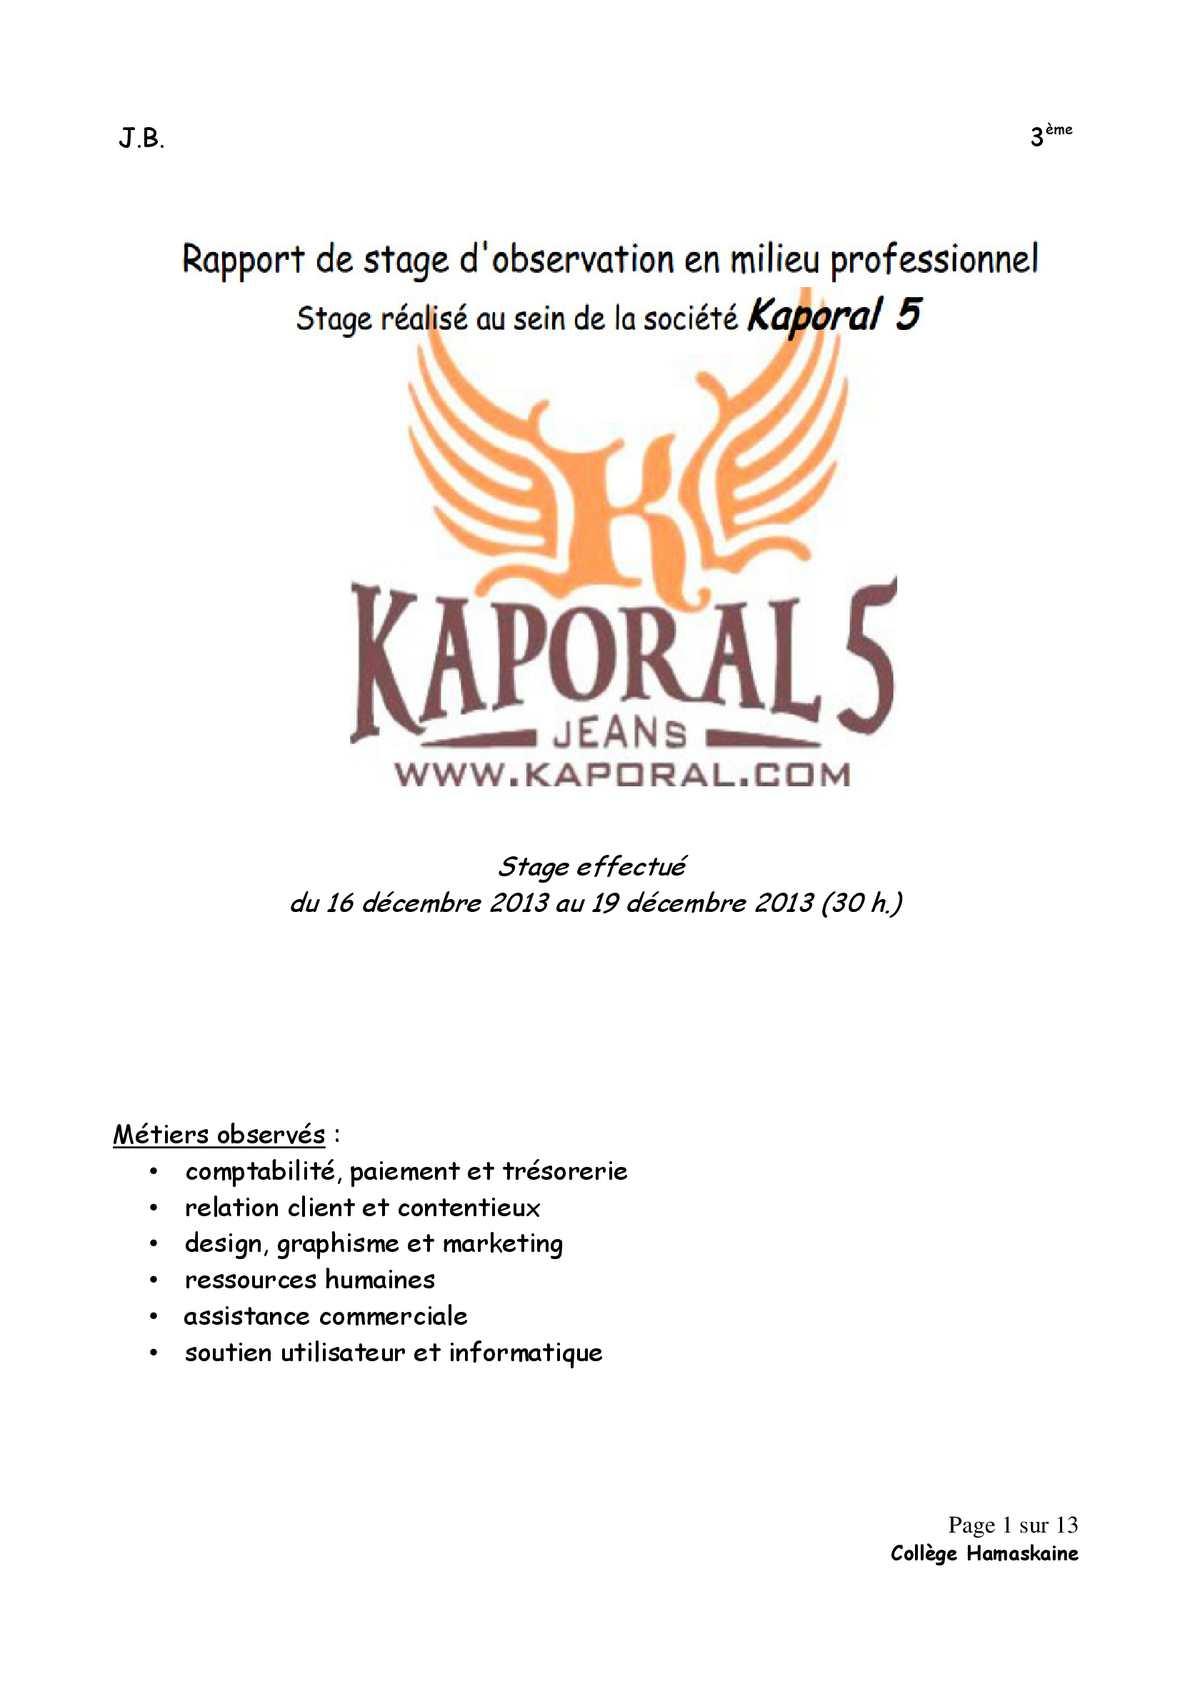 Resume cover letter non profit sample resume cover letter - Rapport de stage 3eme cabinet medical ...